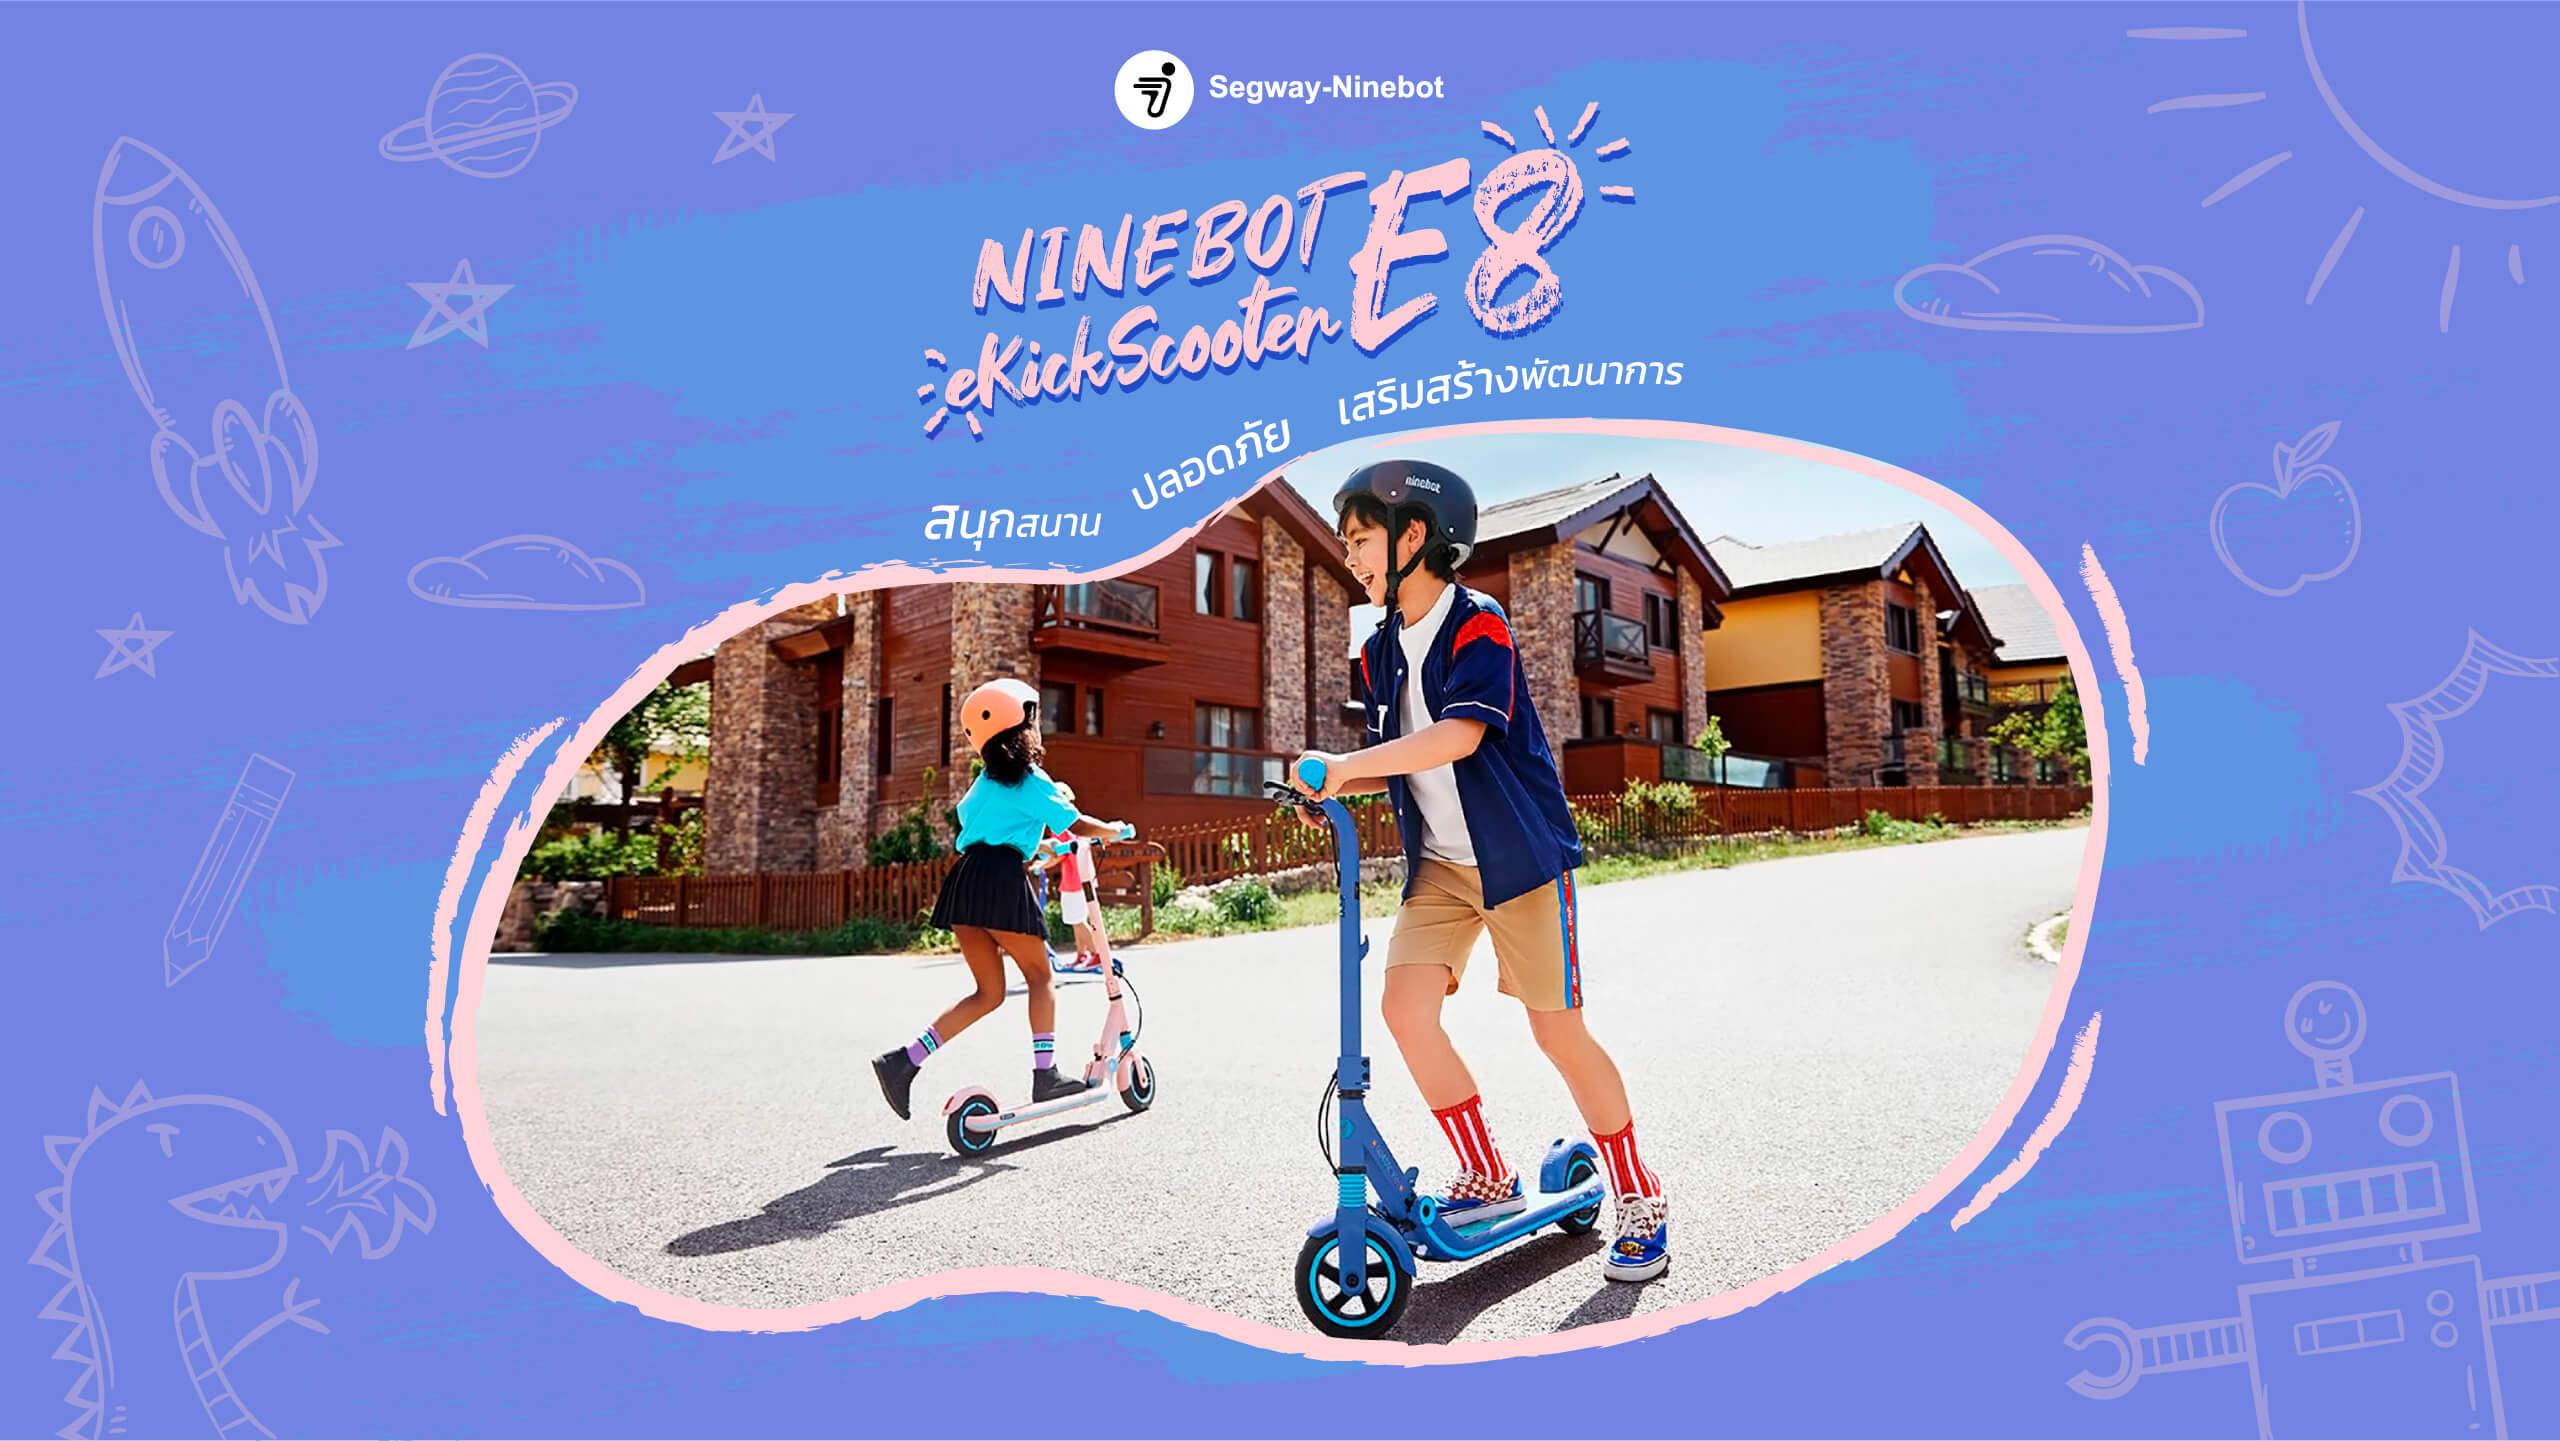 Ninebot KickScooter E8 Hero